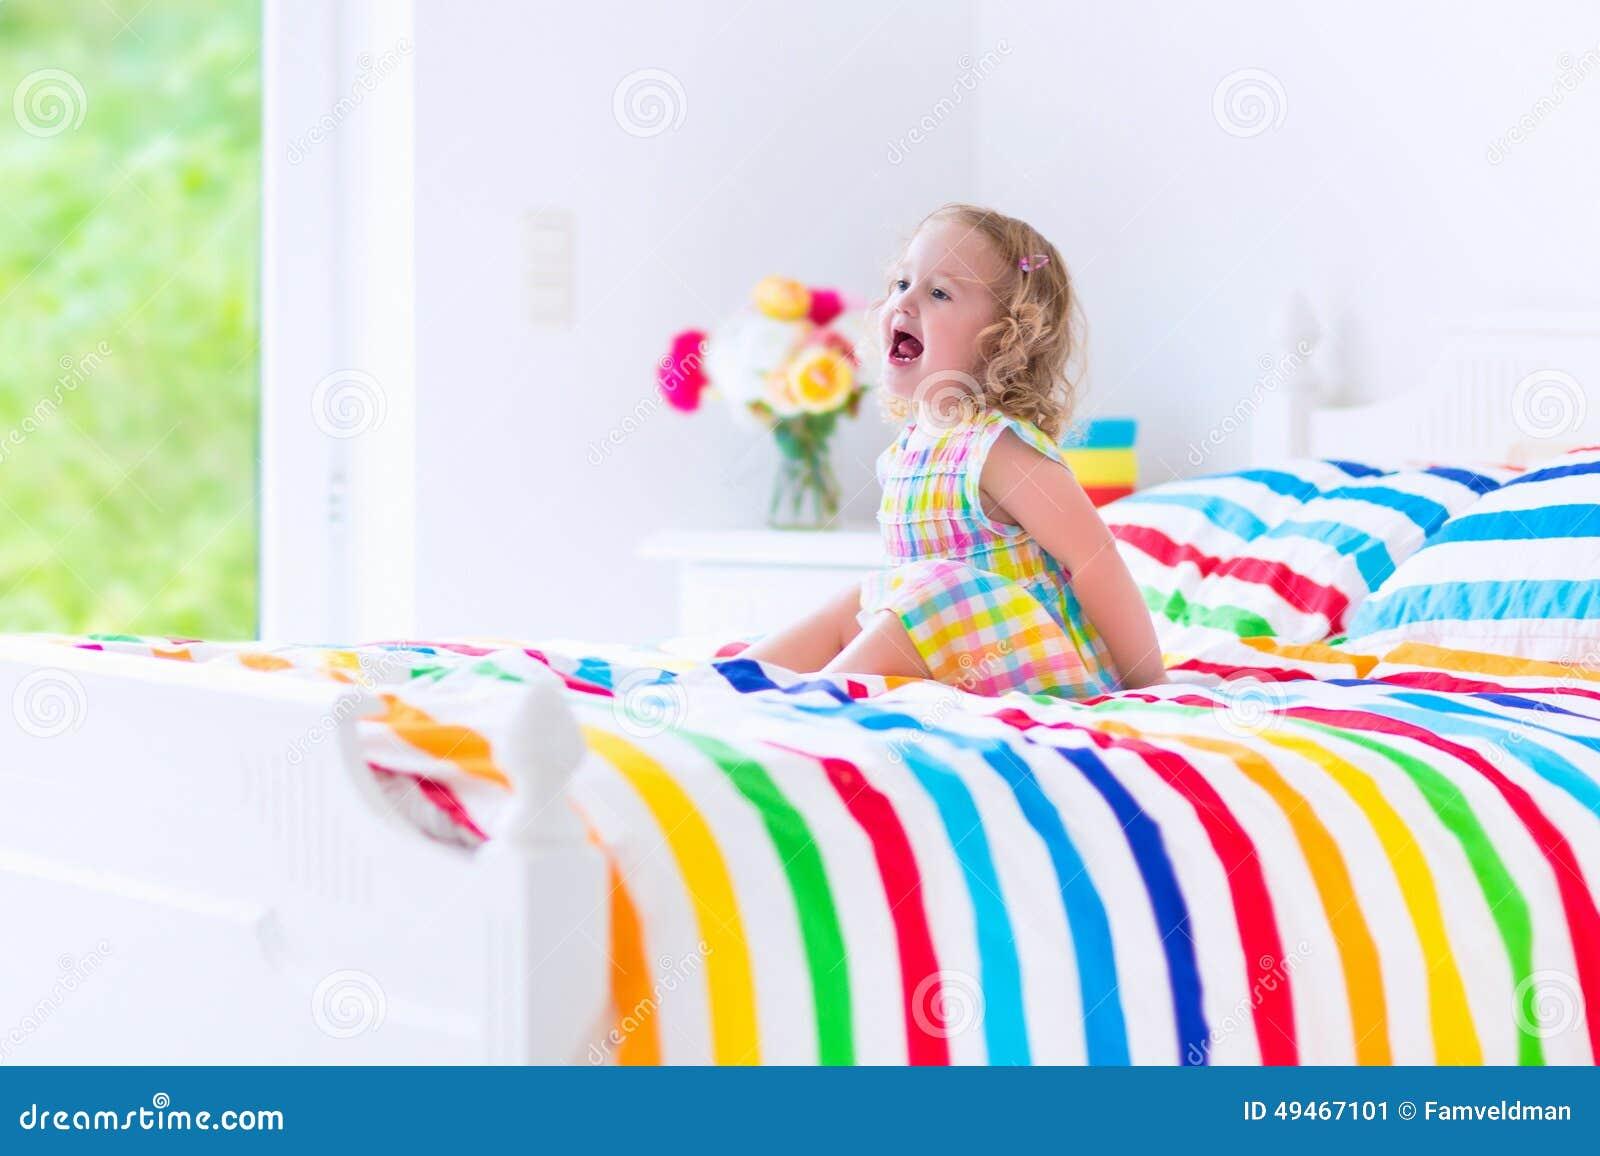 little girl in bed stock image image of active home 49467101. Black Bedroom Furniture Sets. Home Design Ideas